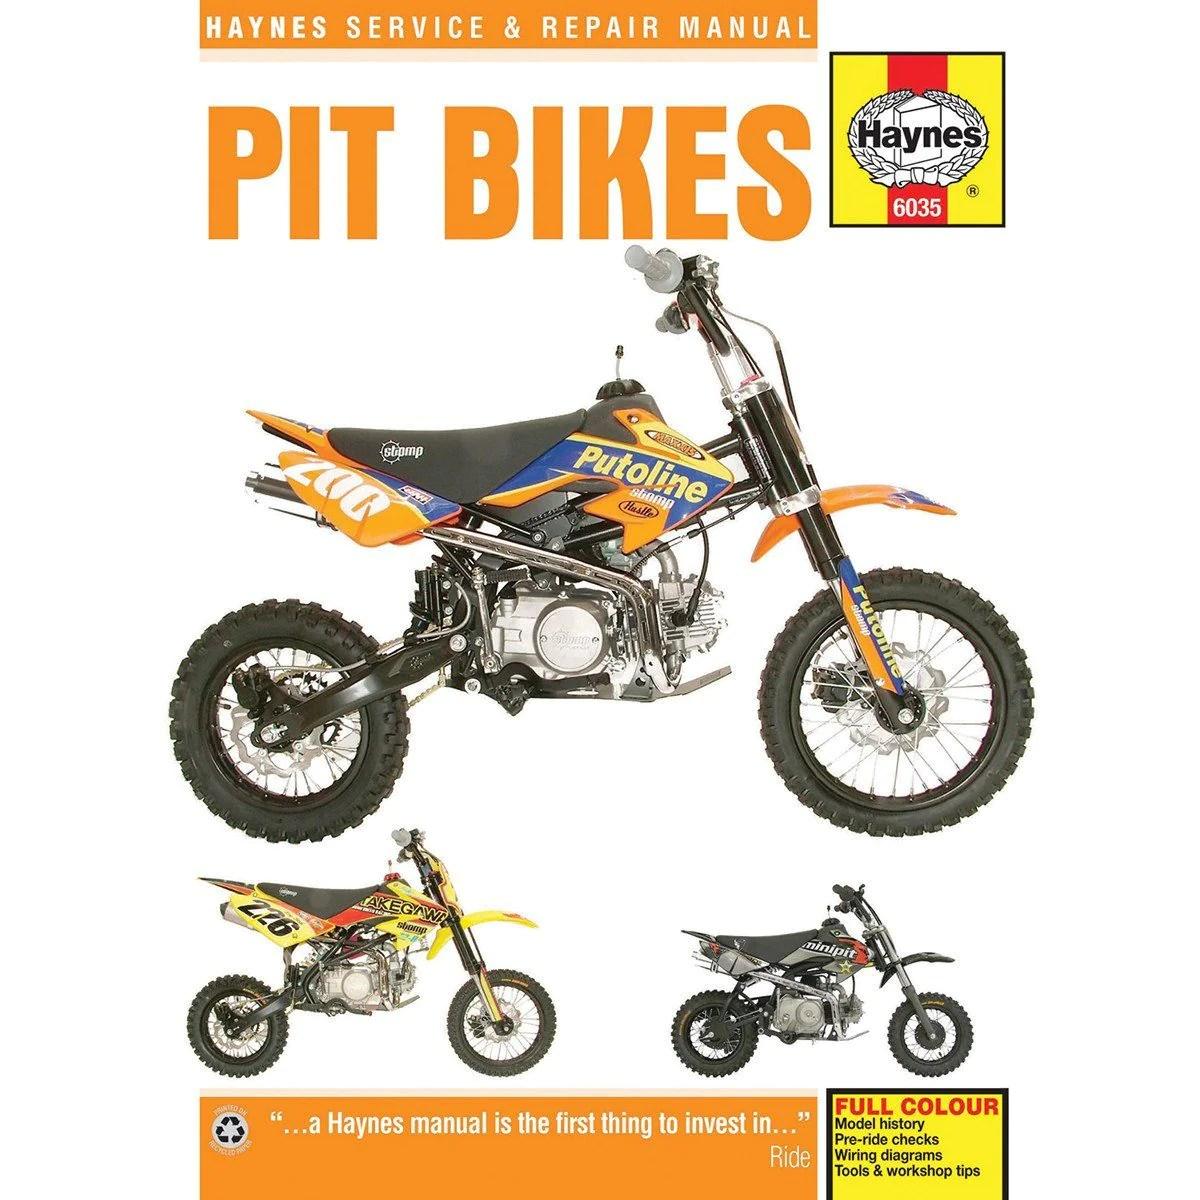 medium resolution of haynes pit bike manual 6035 chinese 4 stroke air cooled horizontal engines